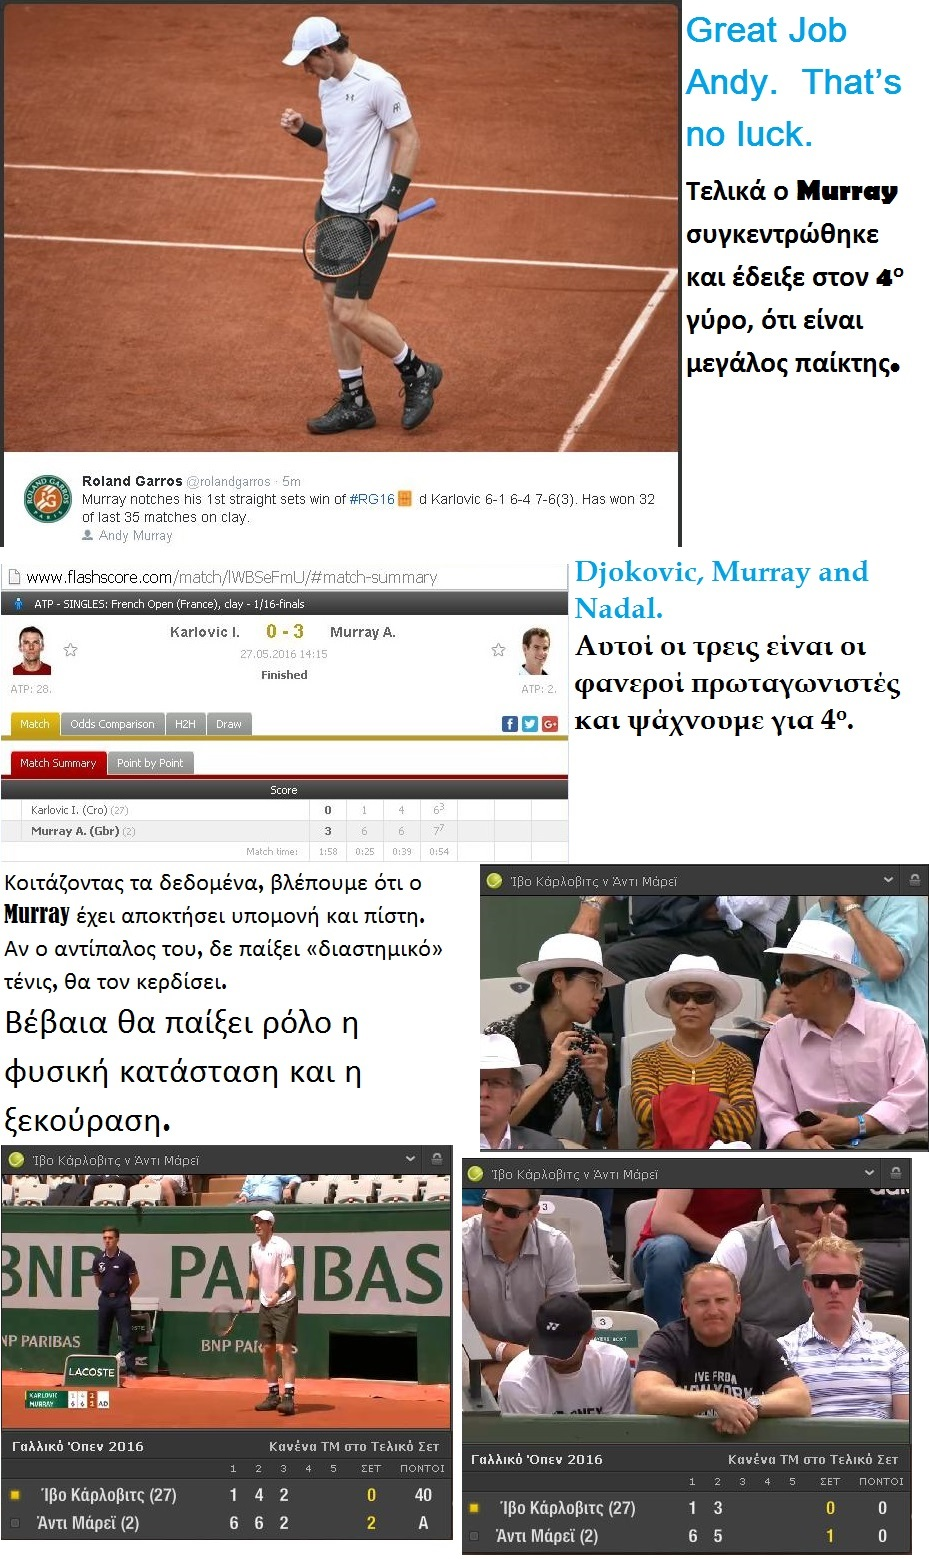 TENNIS GRAND SLAM ROLAND GAROS KARLOVIC VS MURRAY WIN 01 280516